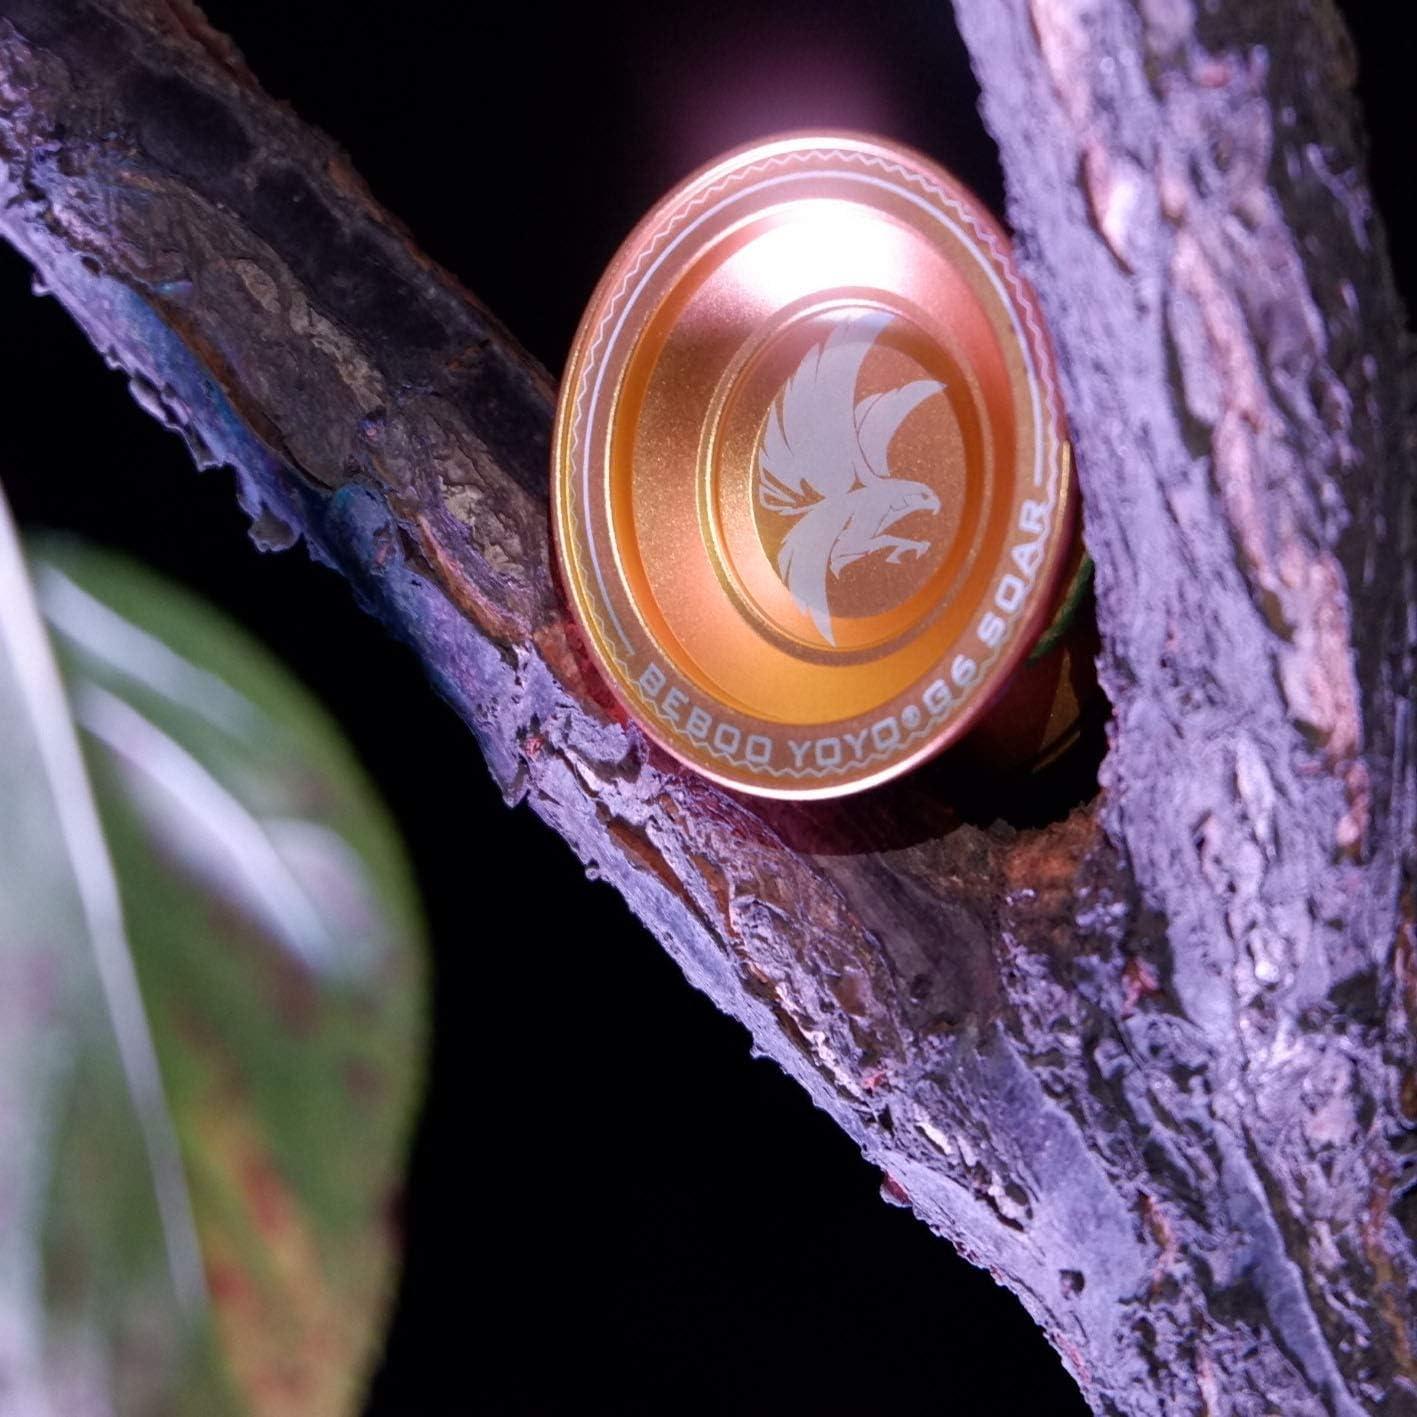 Huan Yu Newest Design Unresponsive YOYO G6 Polished Alloy Aluminum Professional Yo-yo Ball with Decent Package